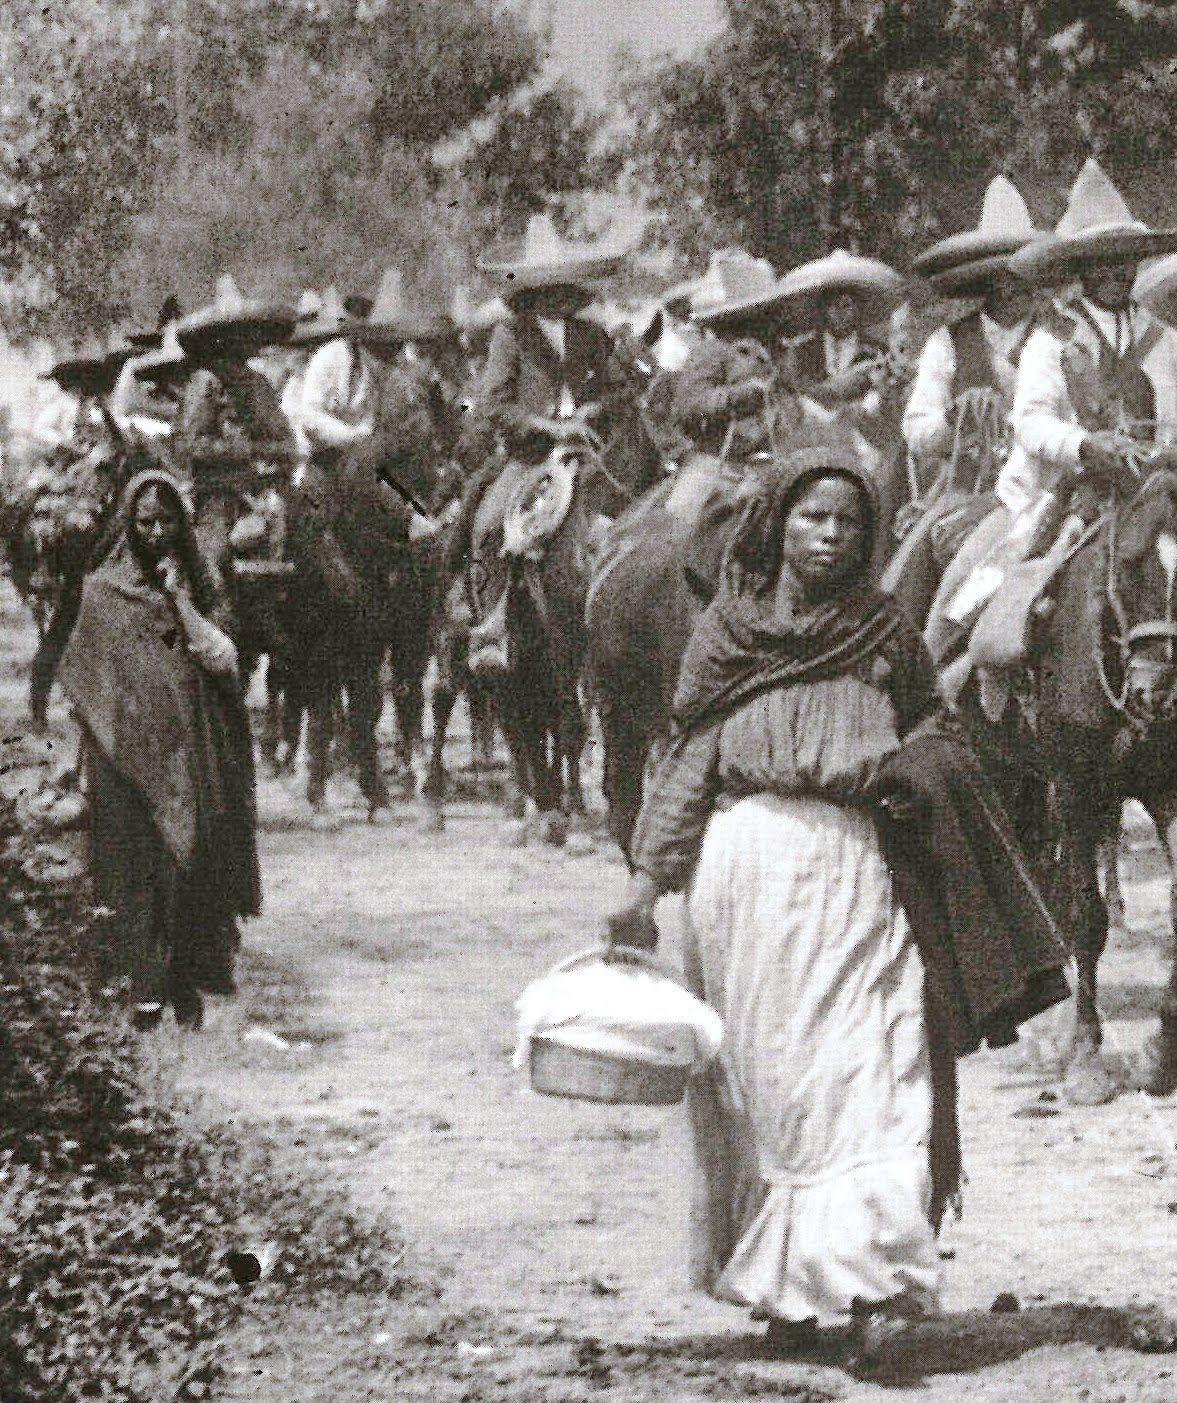 immigration causes and consequences washington state mexican revolution 1913 media cache ak0 pin com originals fd a4 00 fda4003baaf34ba8a6b925bb2bd8e262 jpg